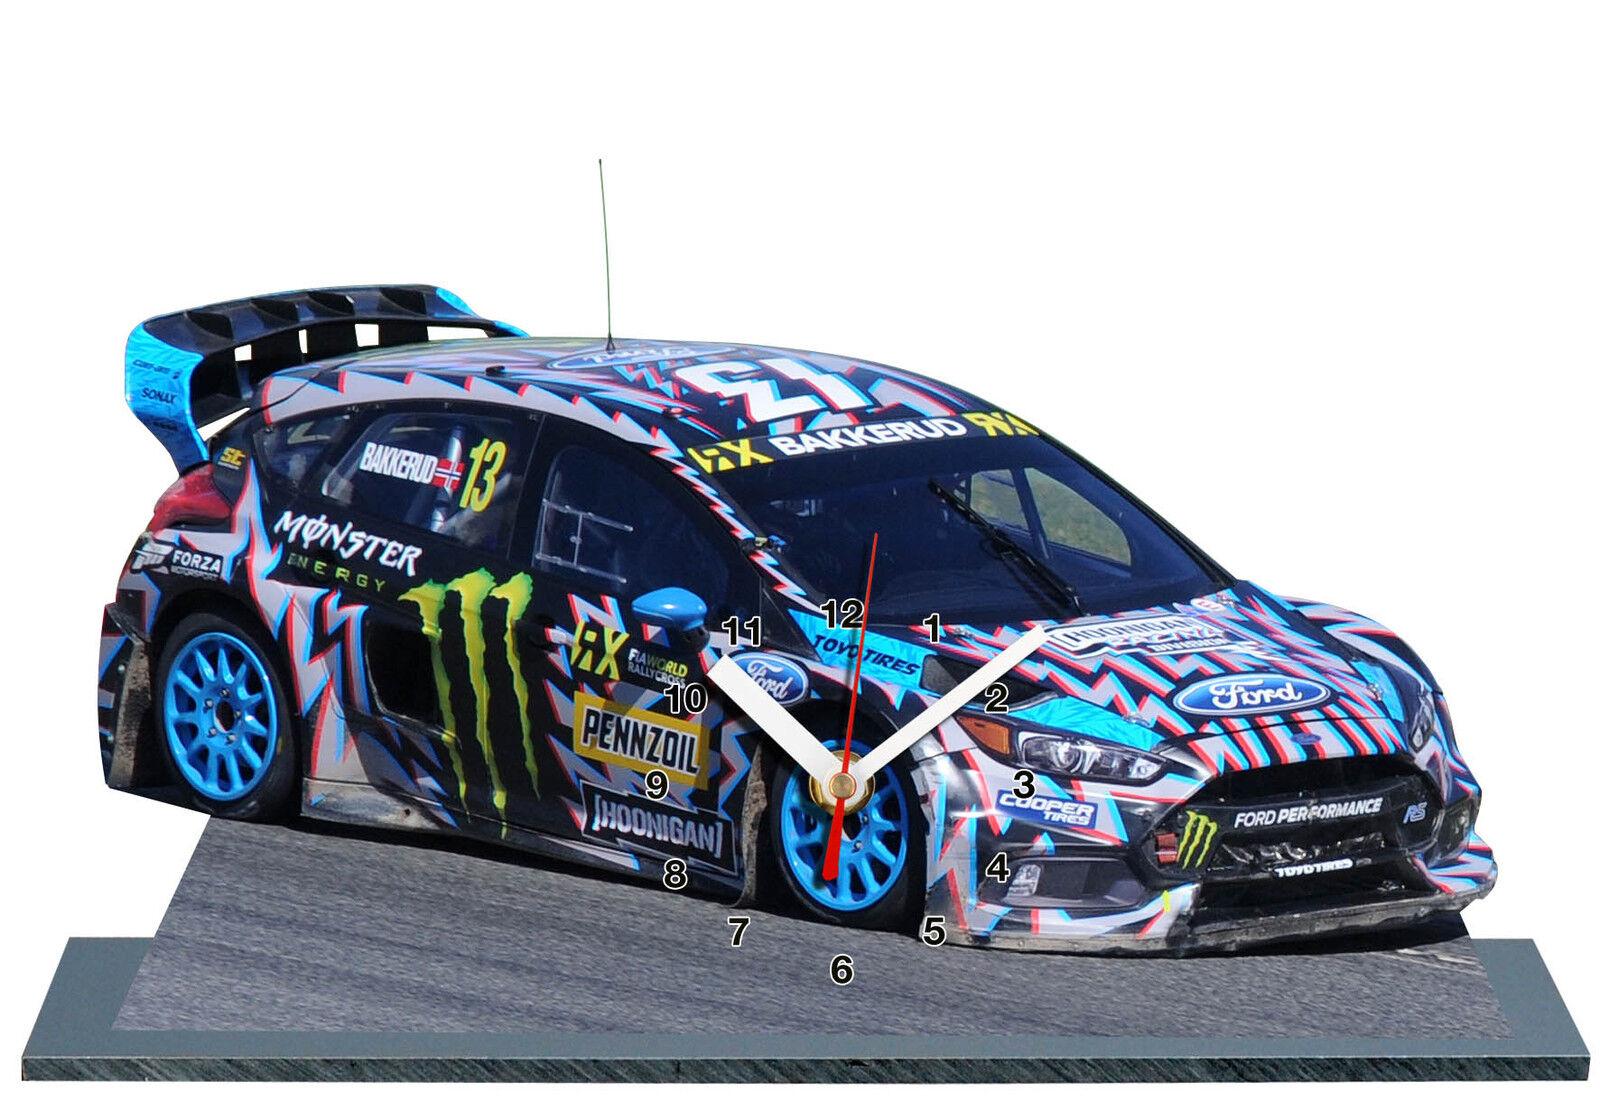 BAKKERUD, Rallycross, Barcelona 2017, Ford , MINIATUR MODELLAUTOS in der Uhr -01